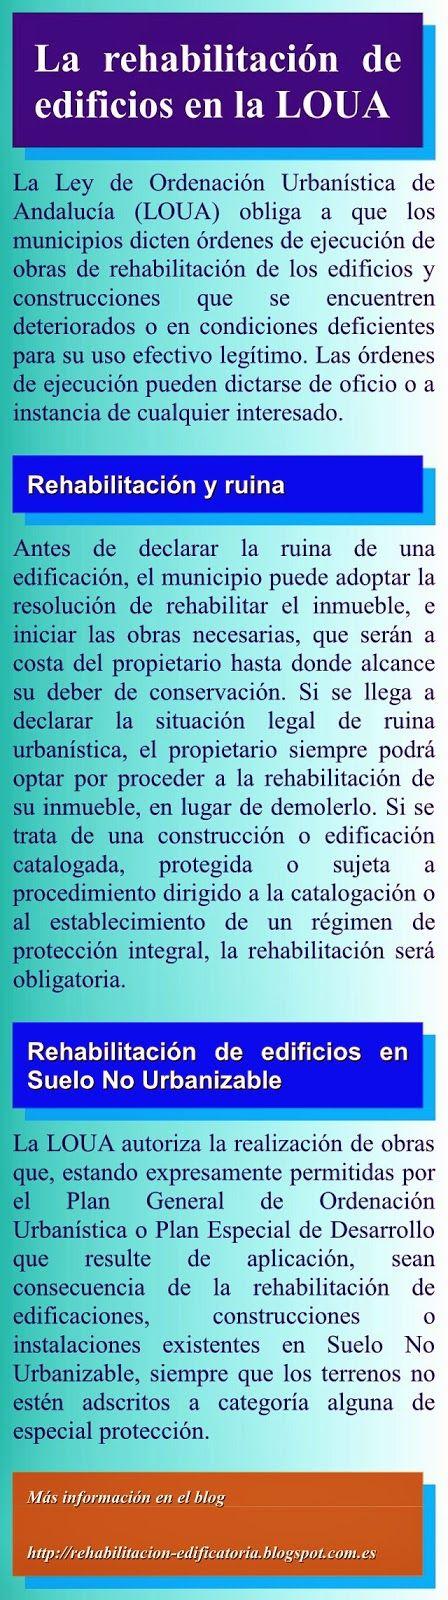 Rehabilitación de edificios: ID02. Rehabilitación de edificios en la legislación andaluza